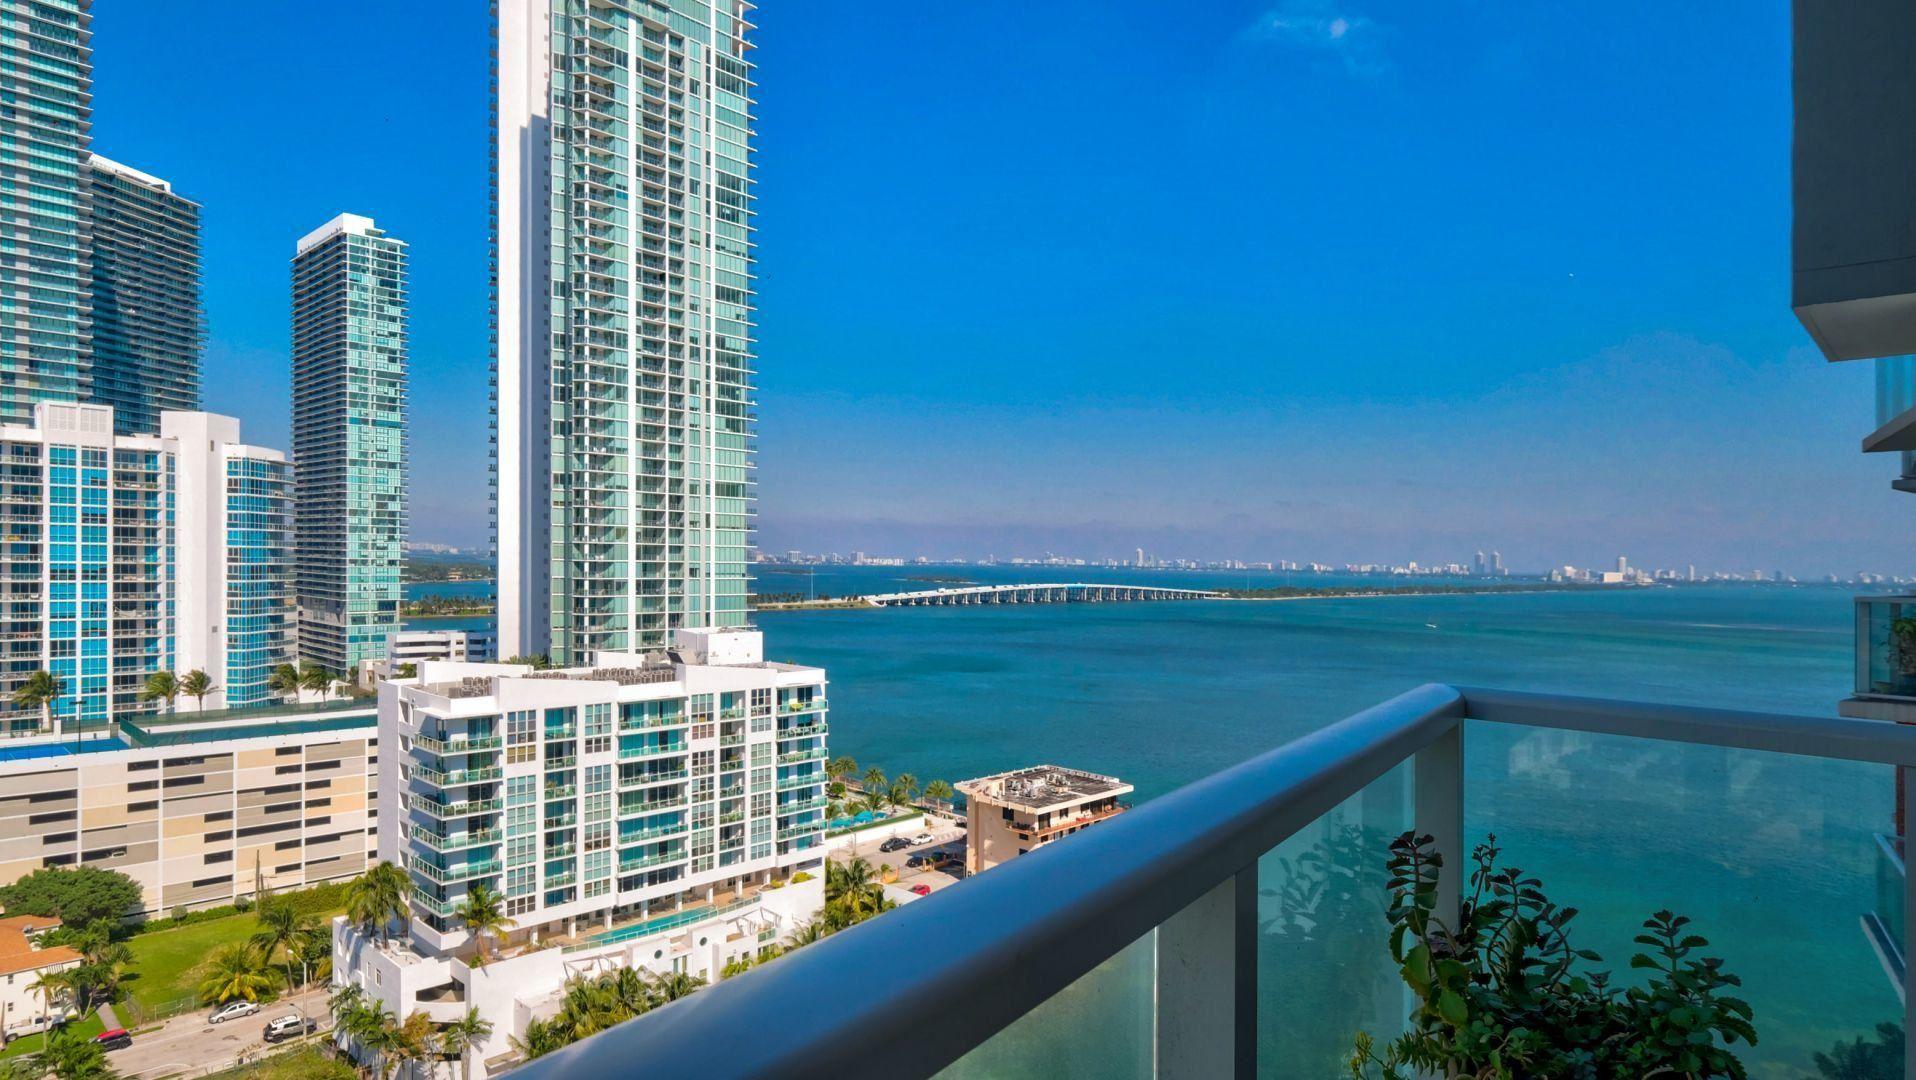 601 NE 27th Street #1701, Miami, FL 33137 - #: RX-10621038